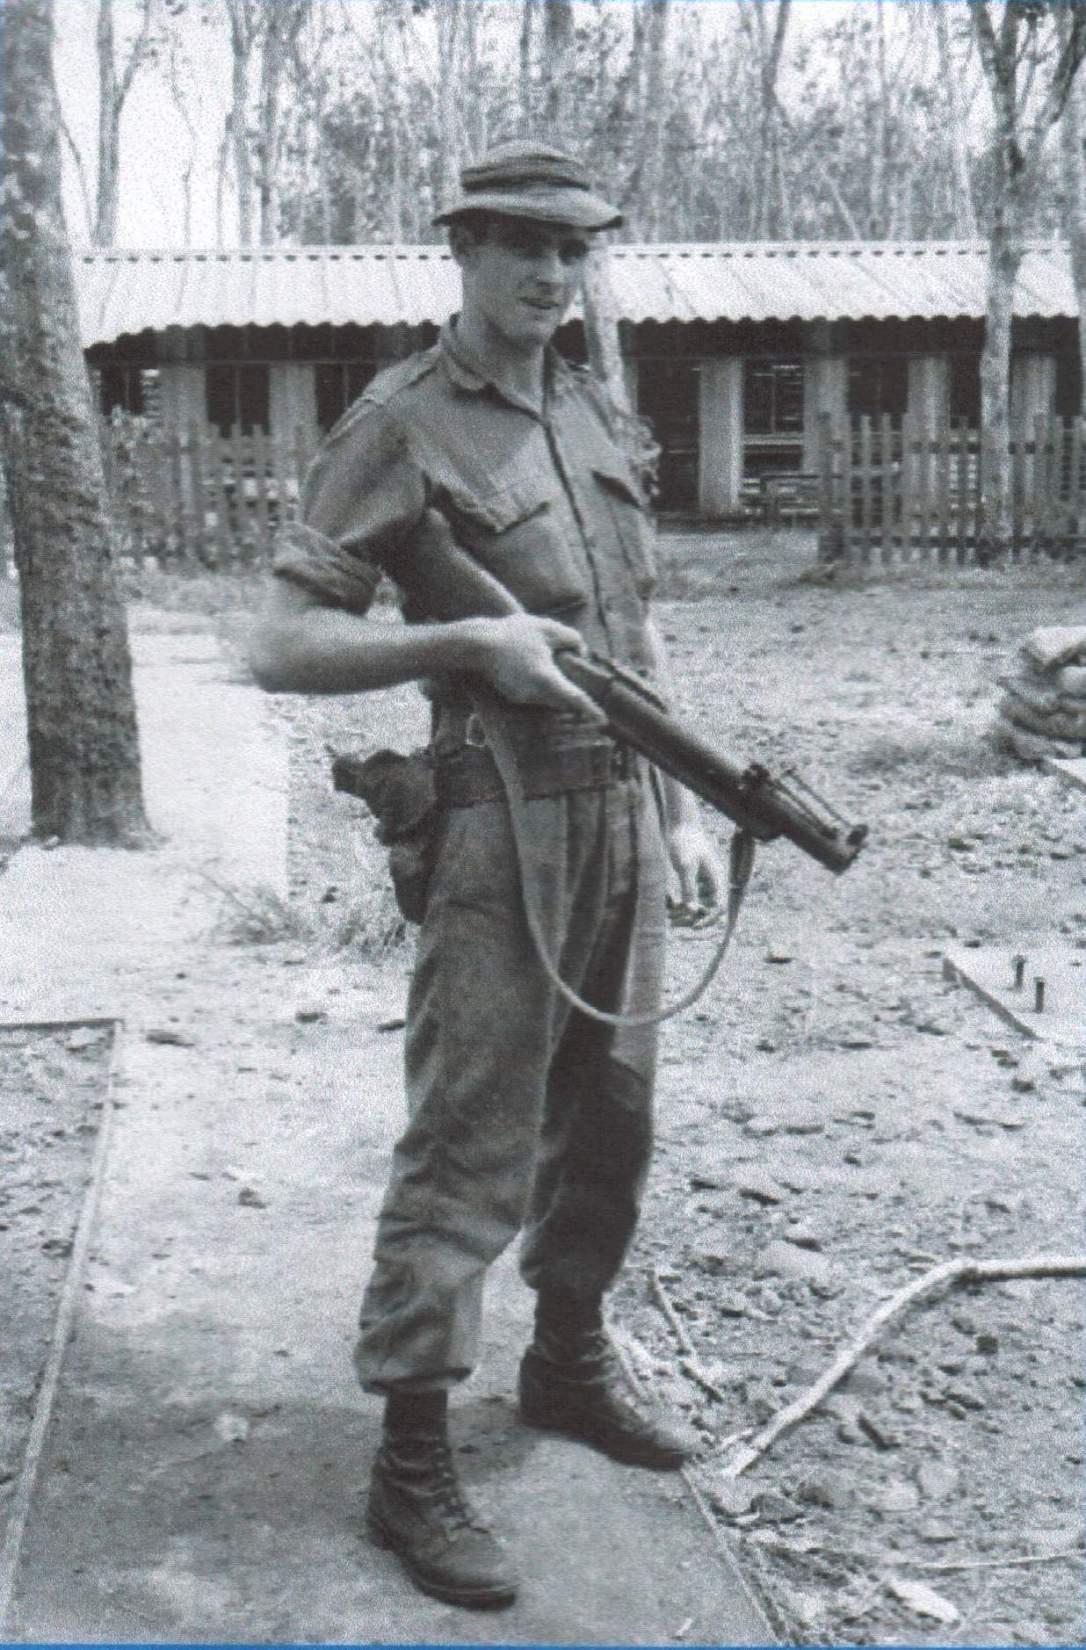 7-Dog-handler 'Slim' Symington with an M79.